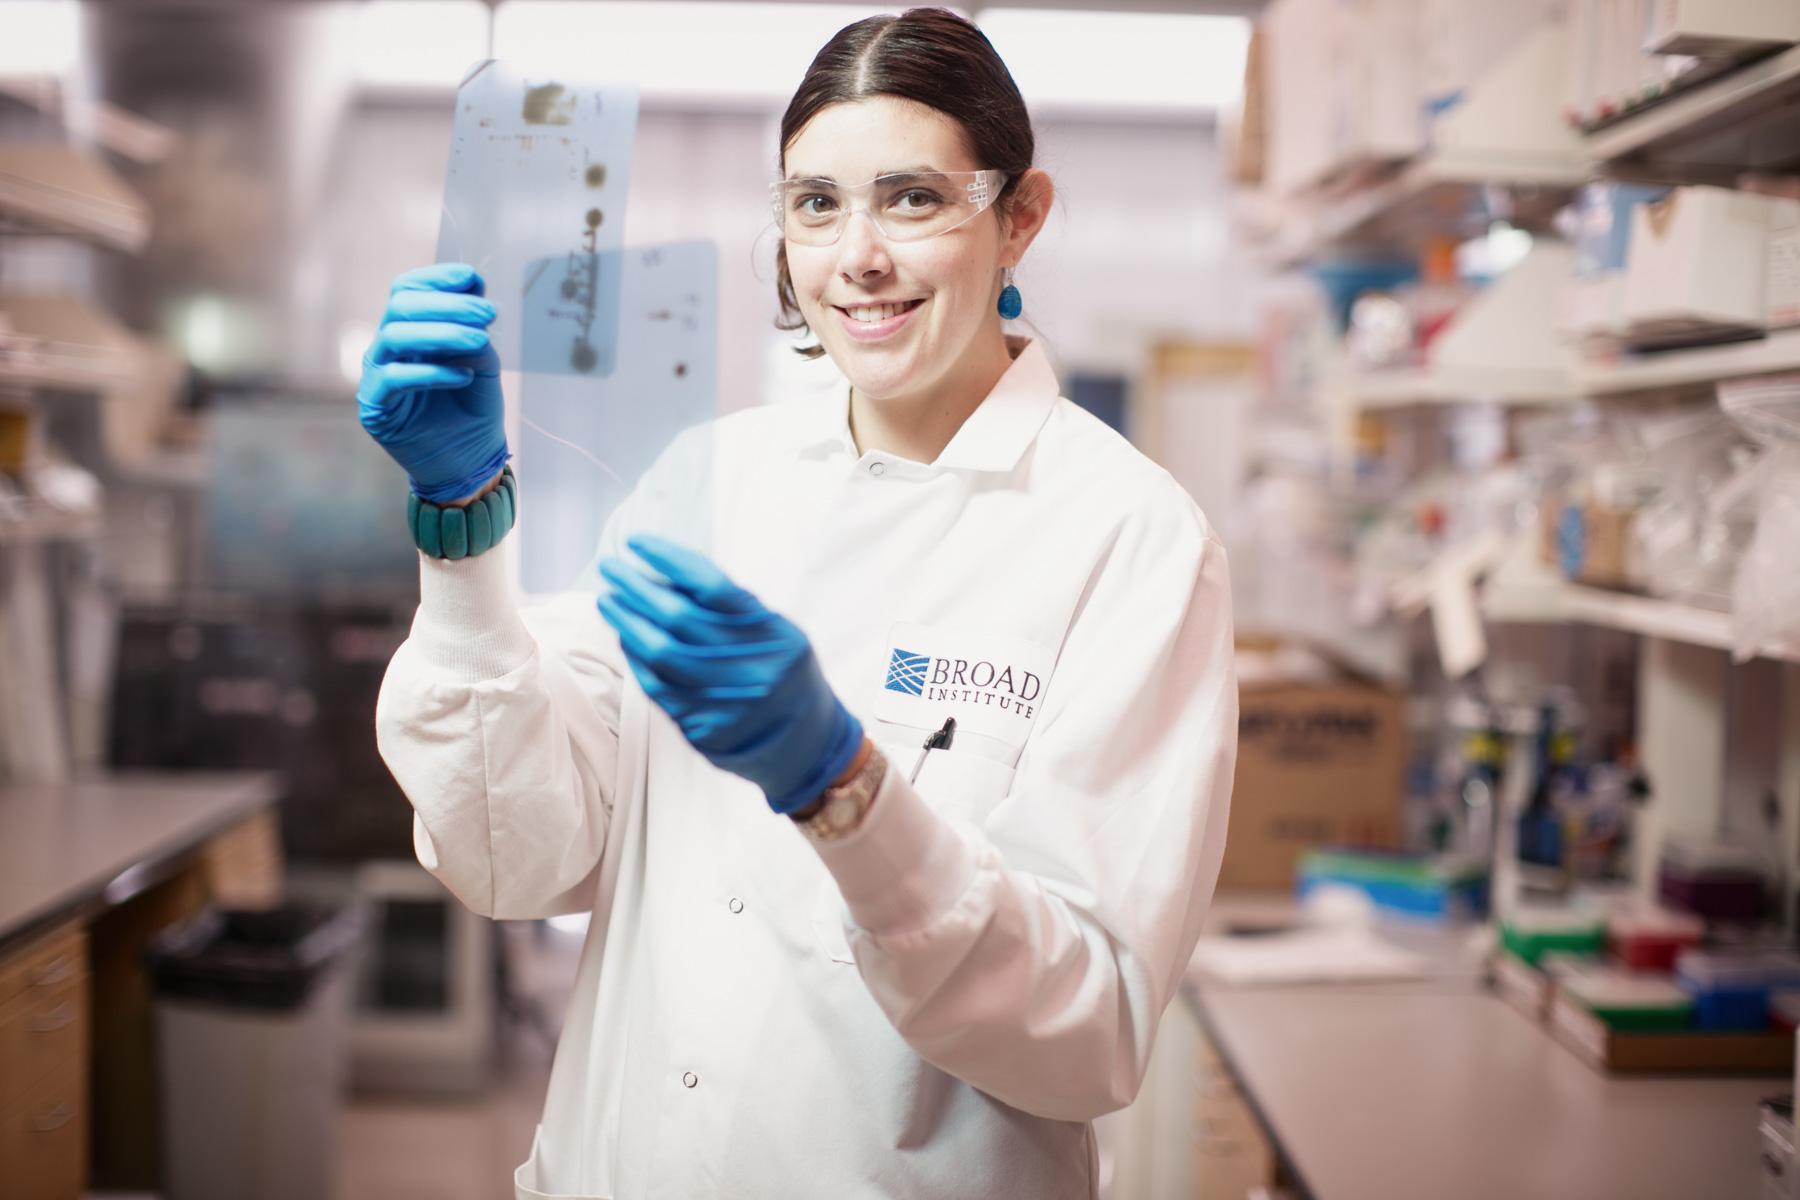 broad-institute-scientist-1.jpg